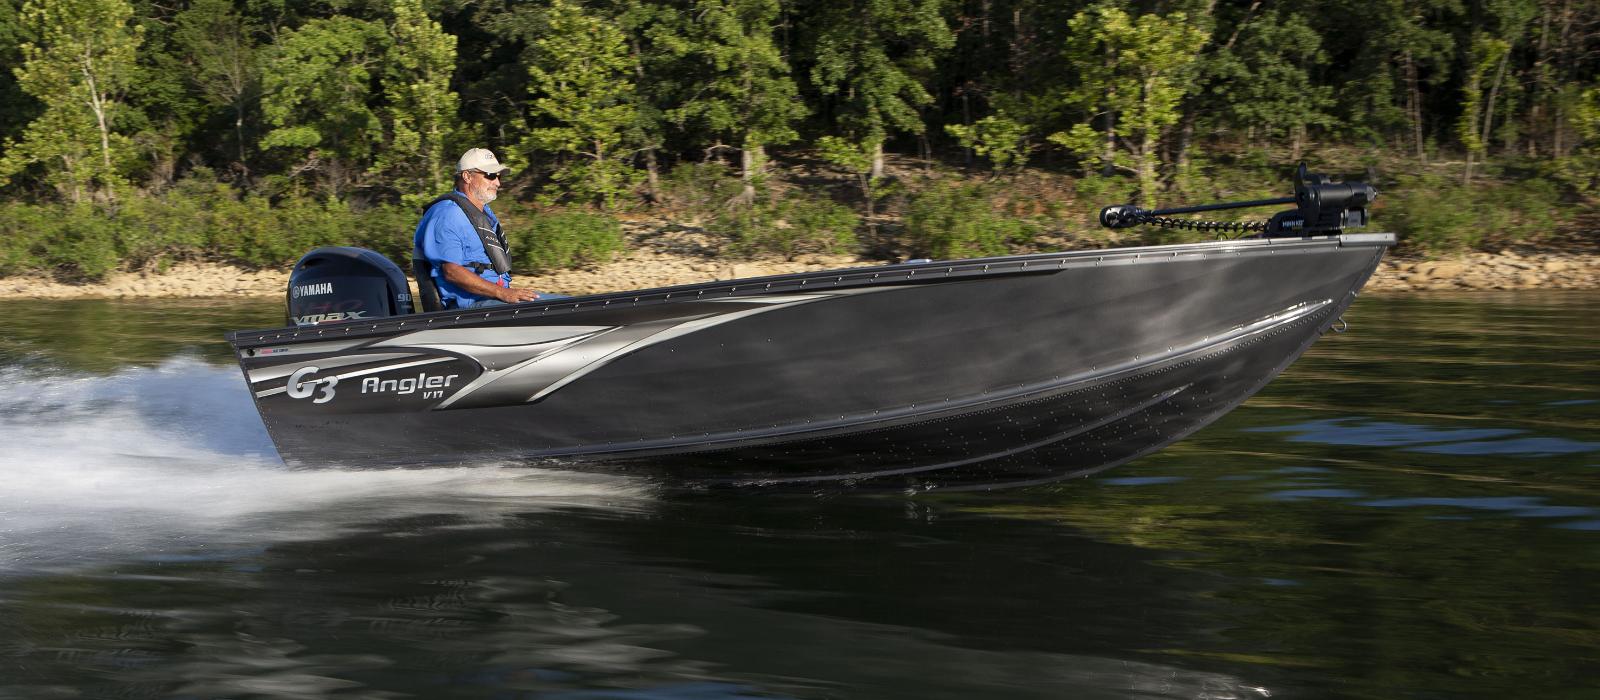 Angler V17 T Running